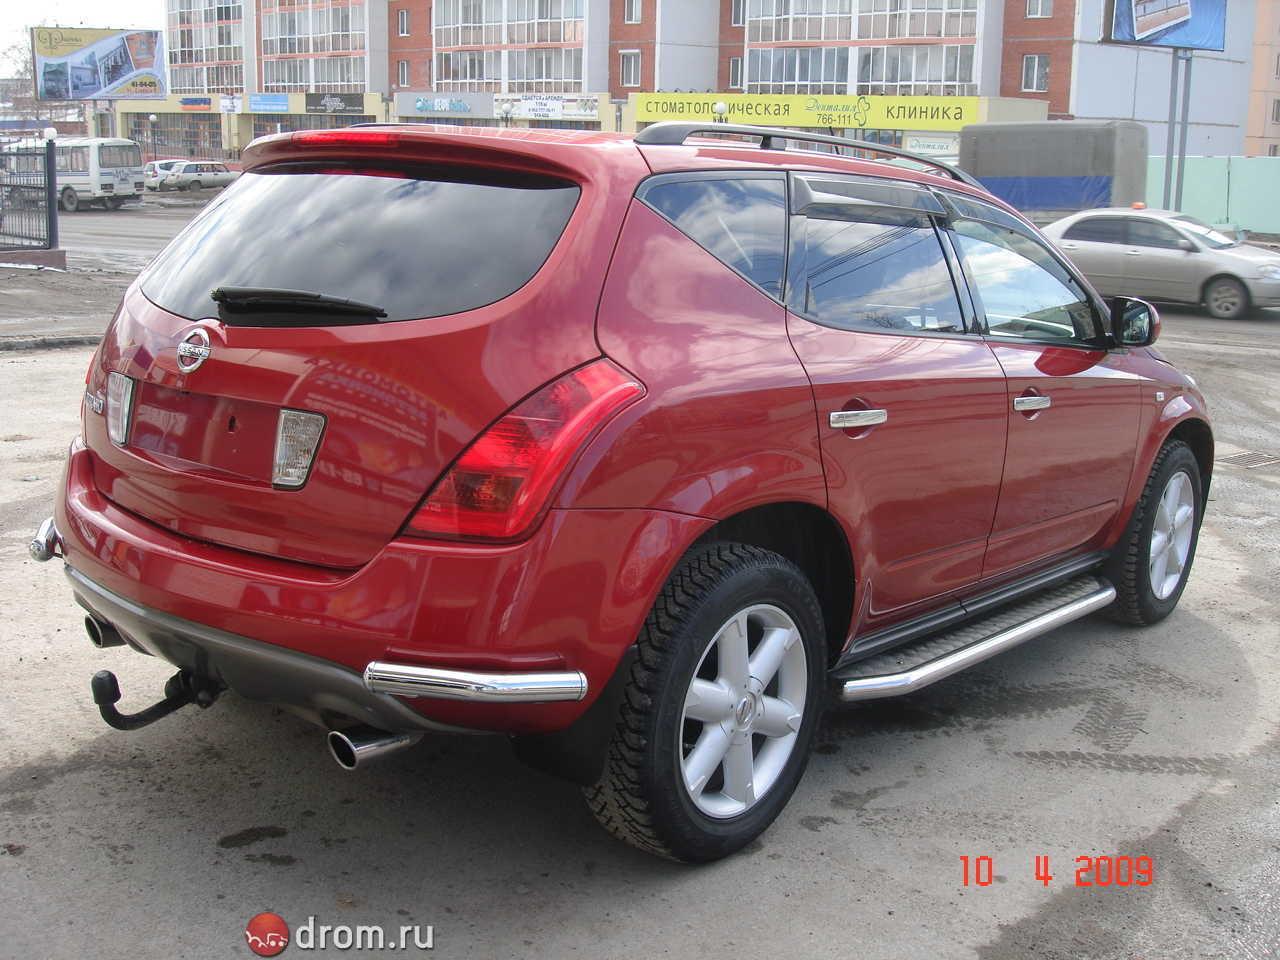 2008 Nissan Murano Photos, 3500cc., Gasoline, Automatic For Sale